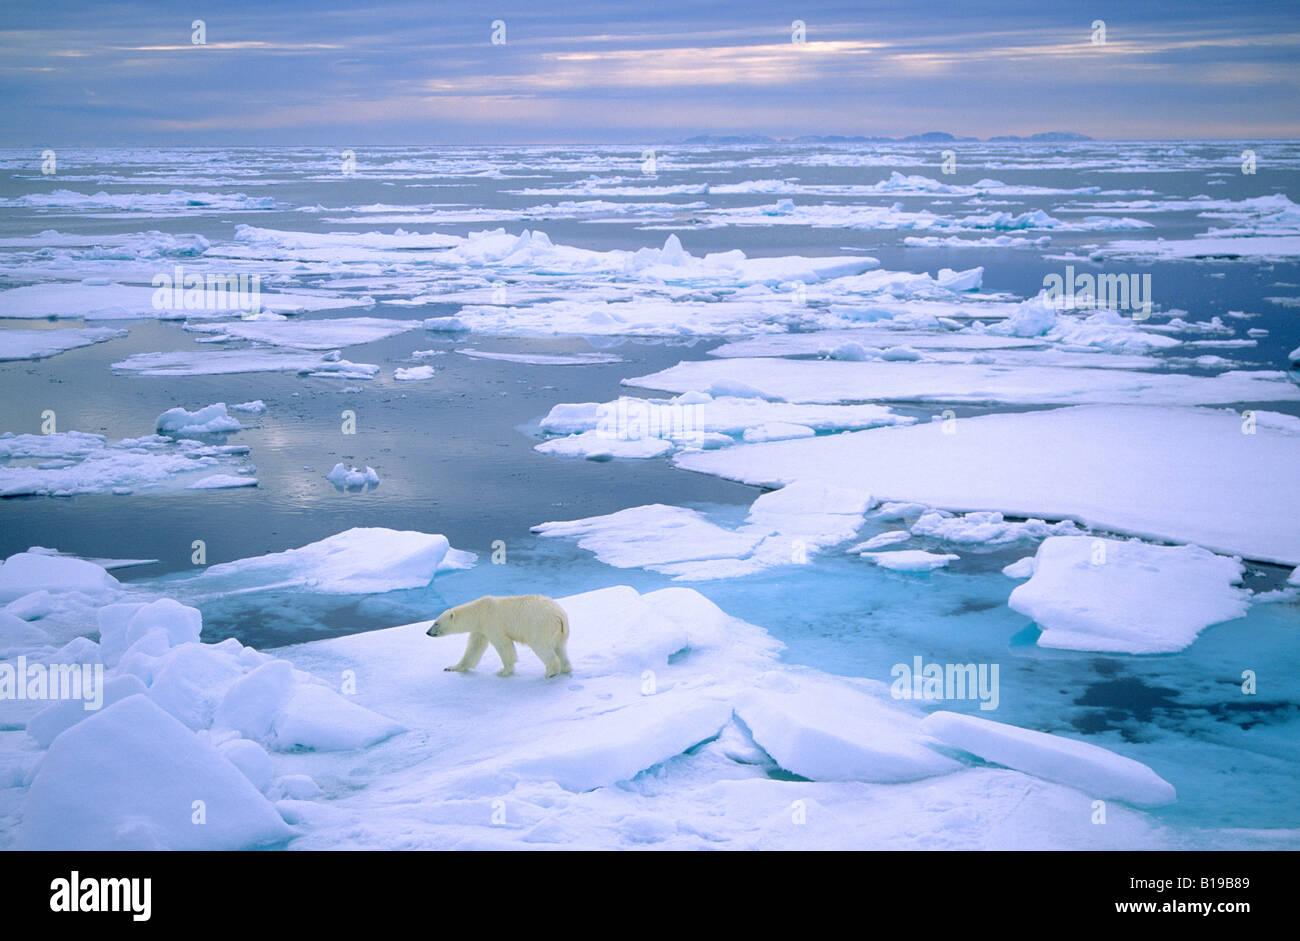 Adulto di orso polare (Ursus maritimus) caccia sulla banchisa. Svalbard, Norvegia. Immagini Stock